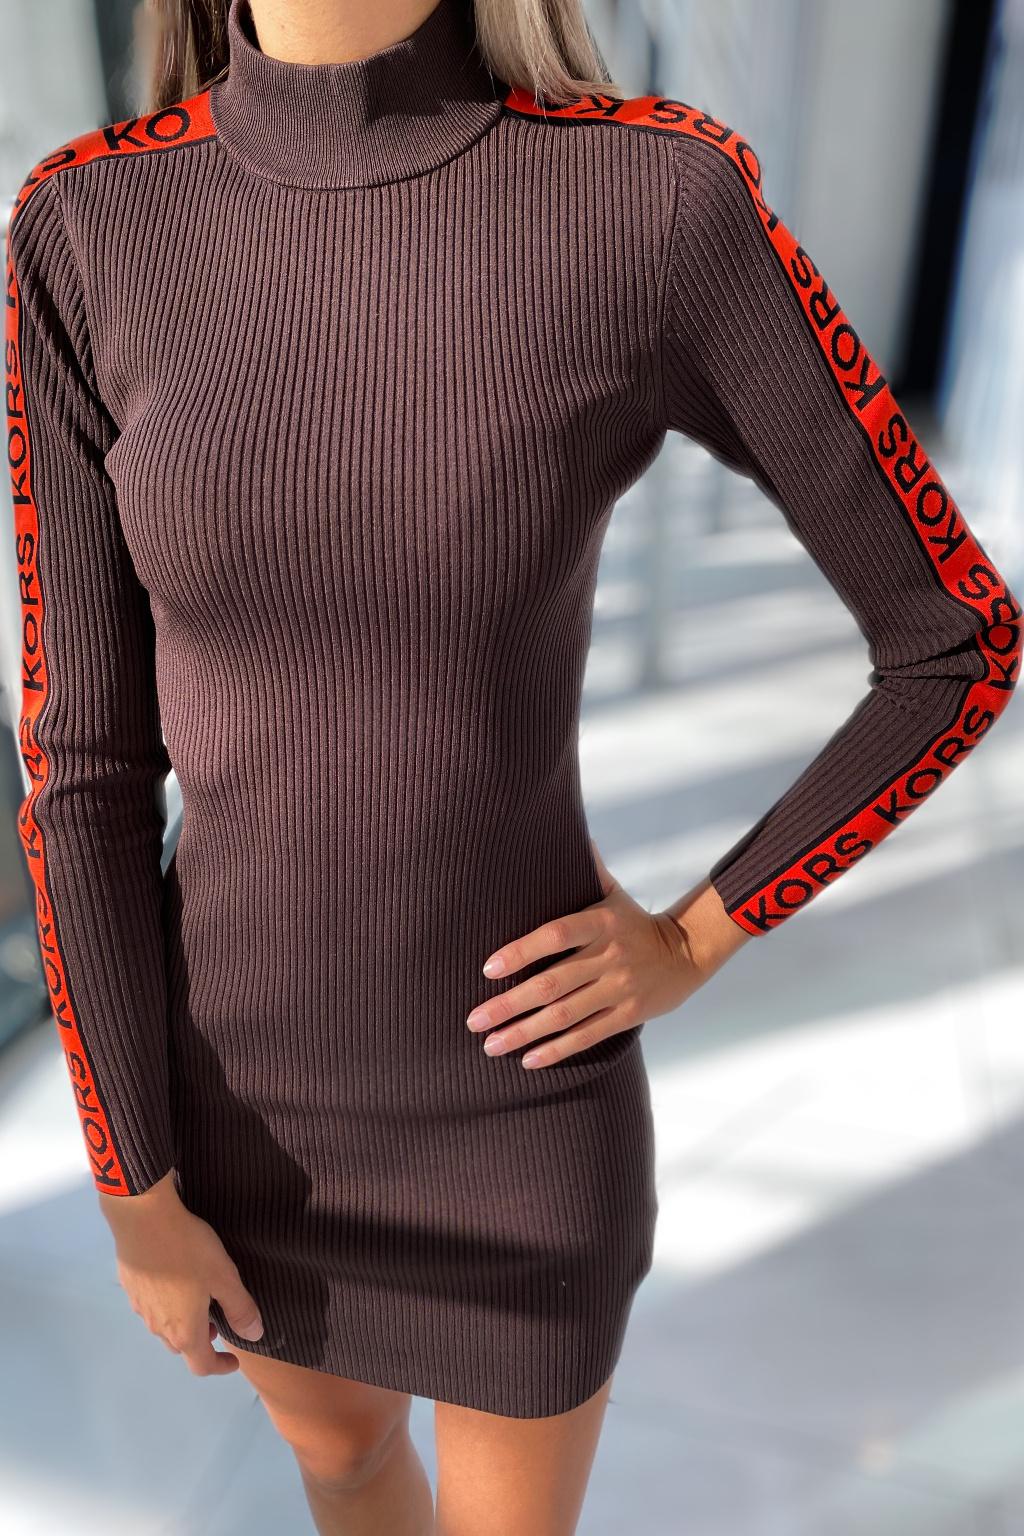 Dámské šaty Michael Kors MF180SF33D hnědé